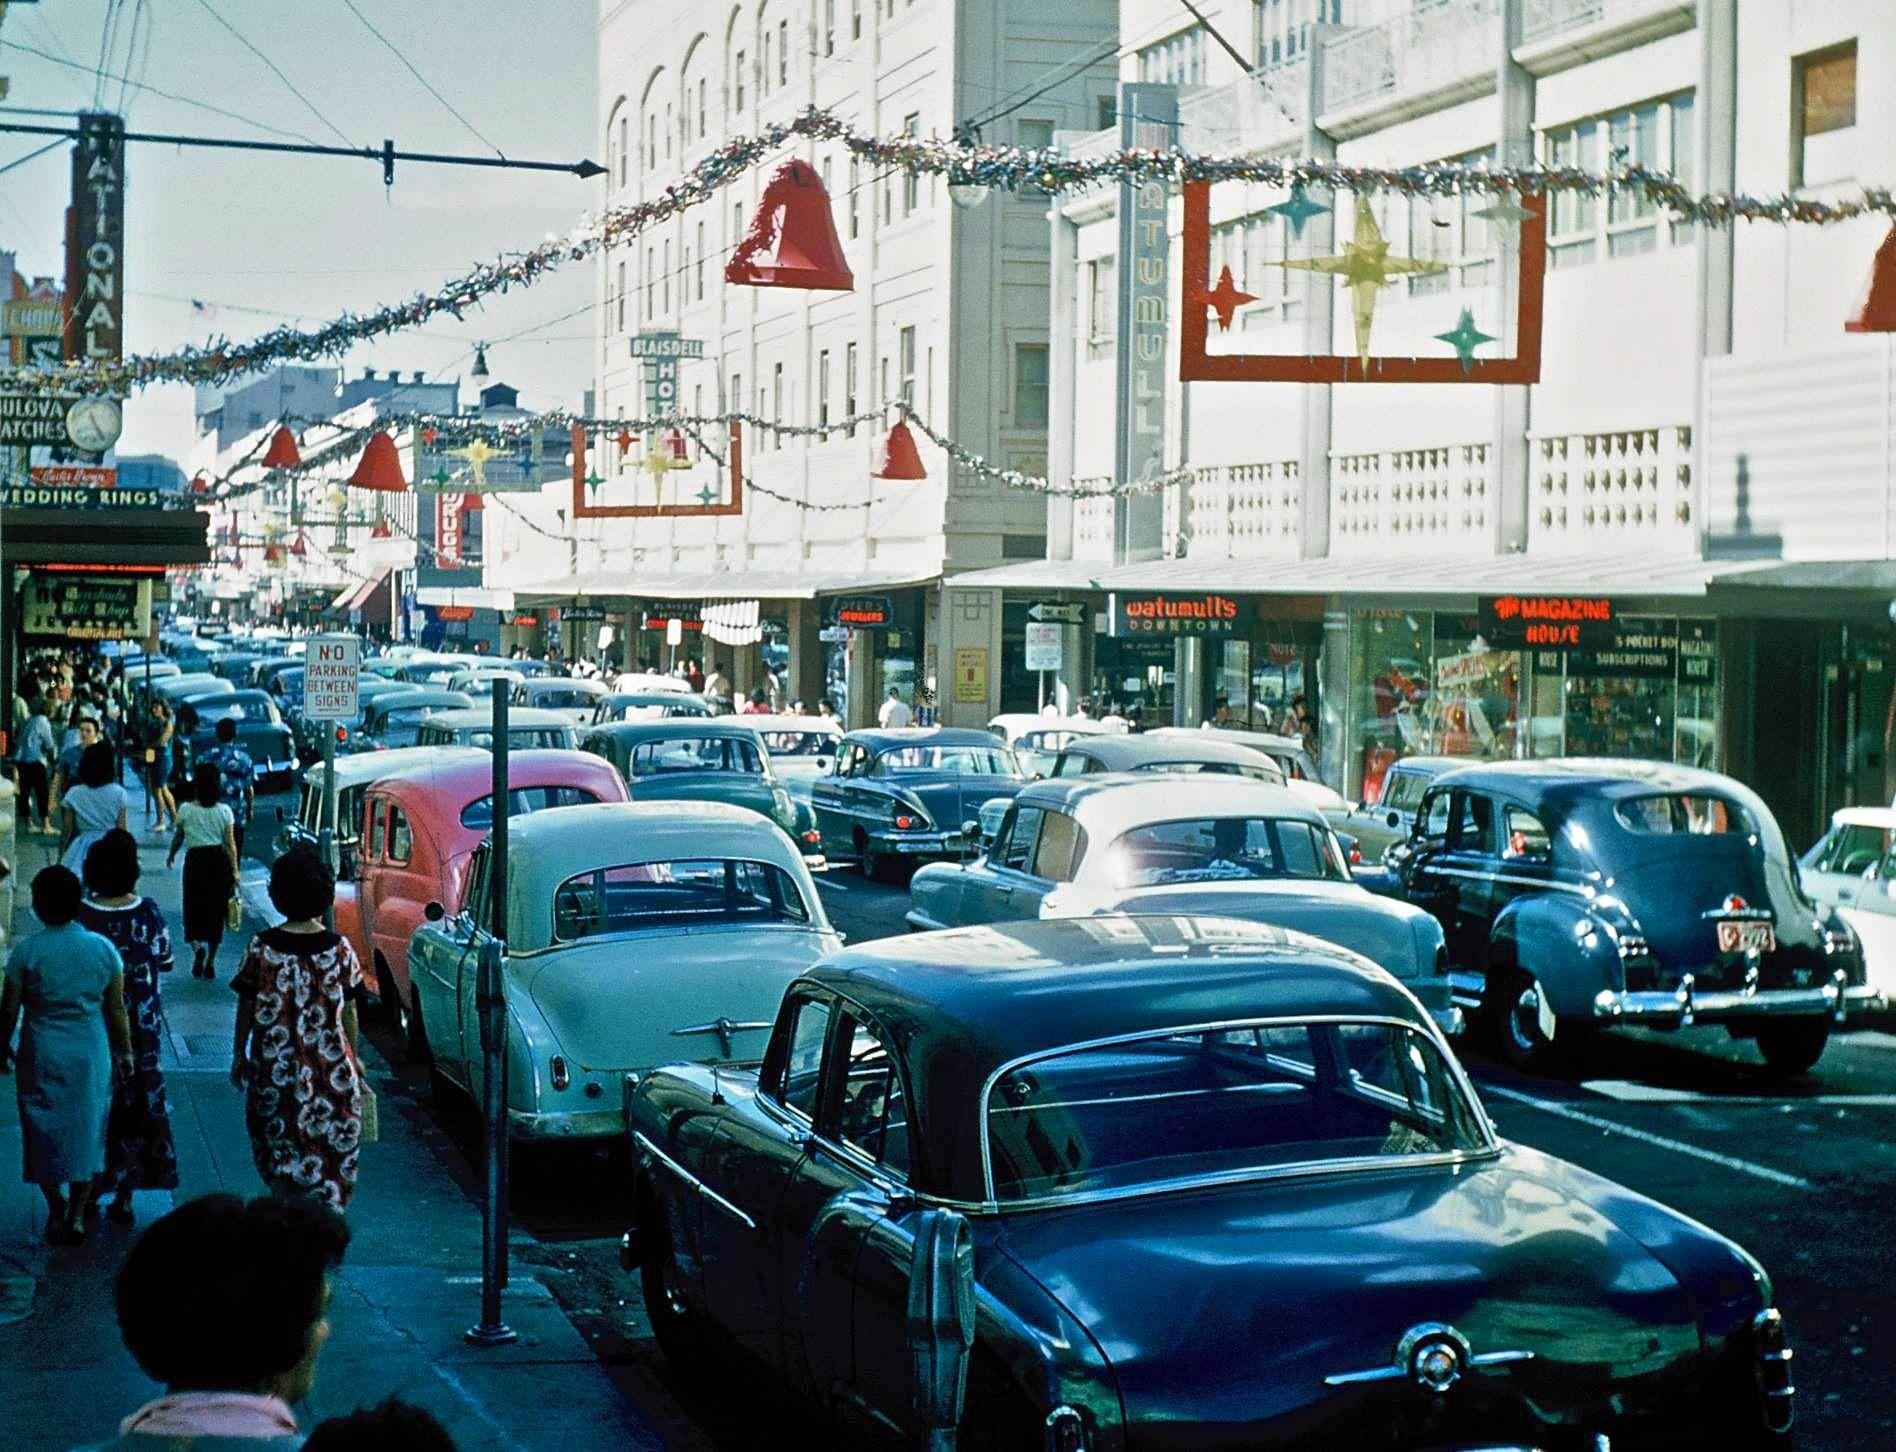 1959 Fort Street Christmas Decorations Honolulu Hawaiʻi